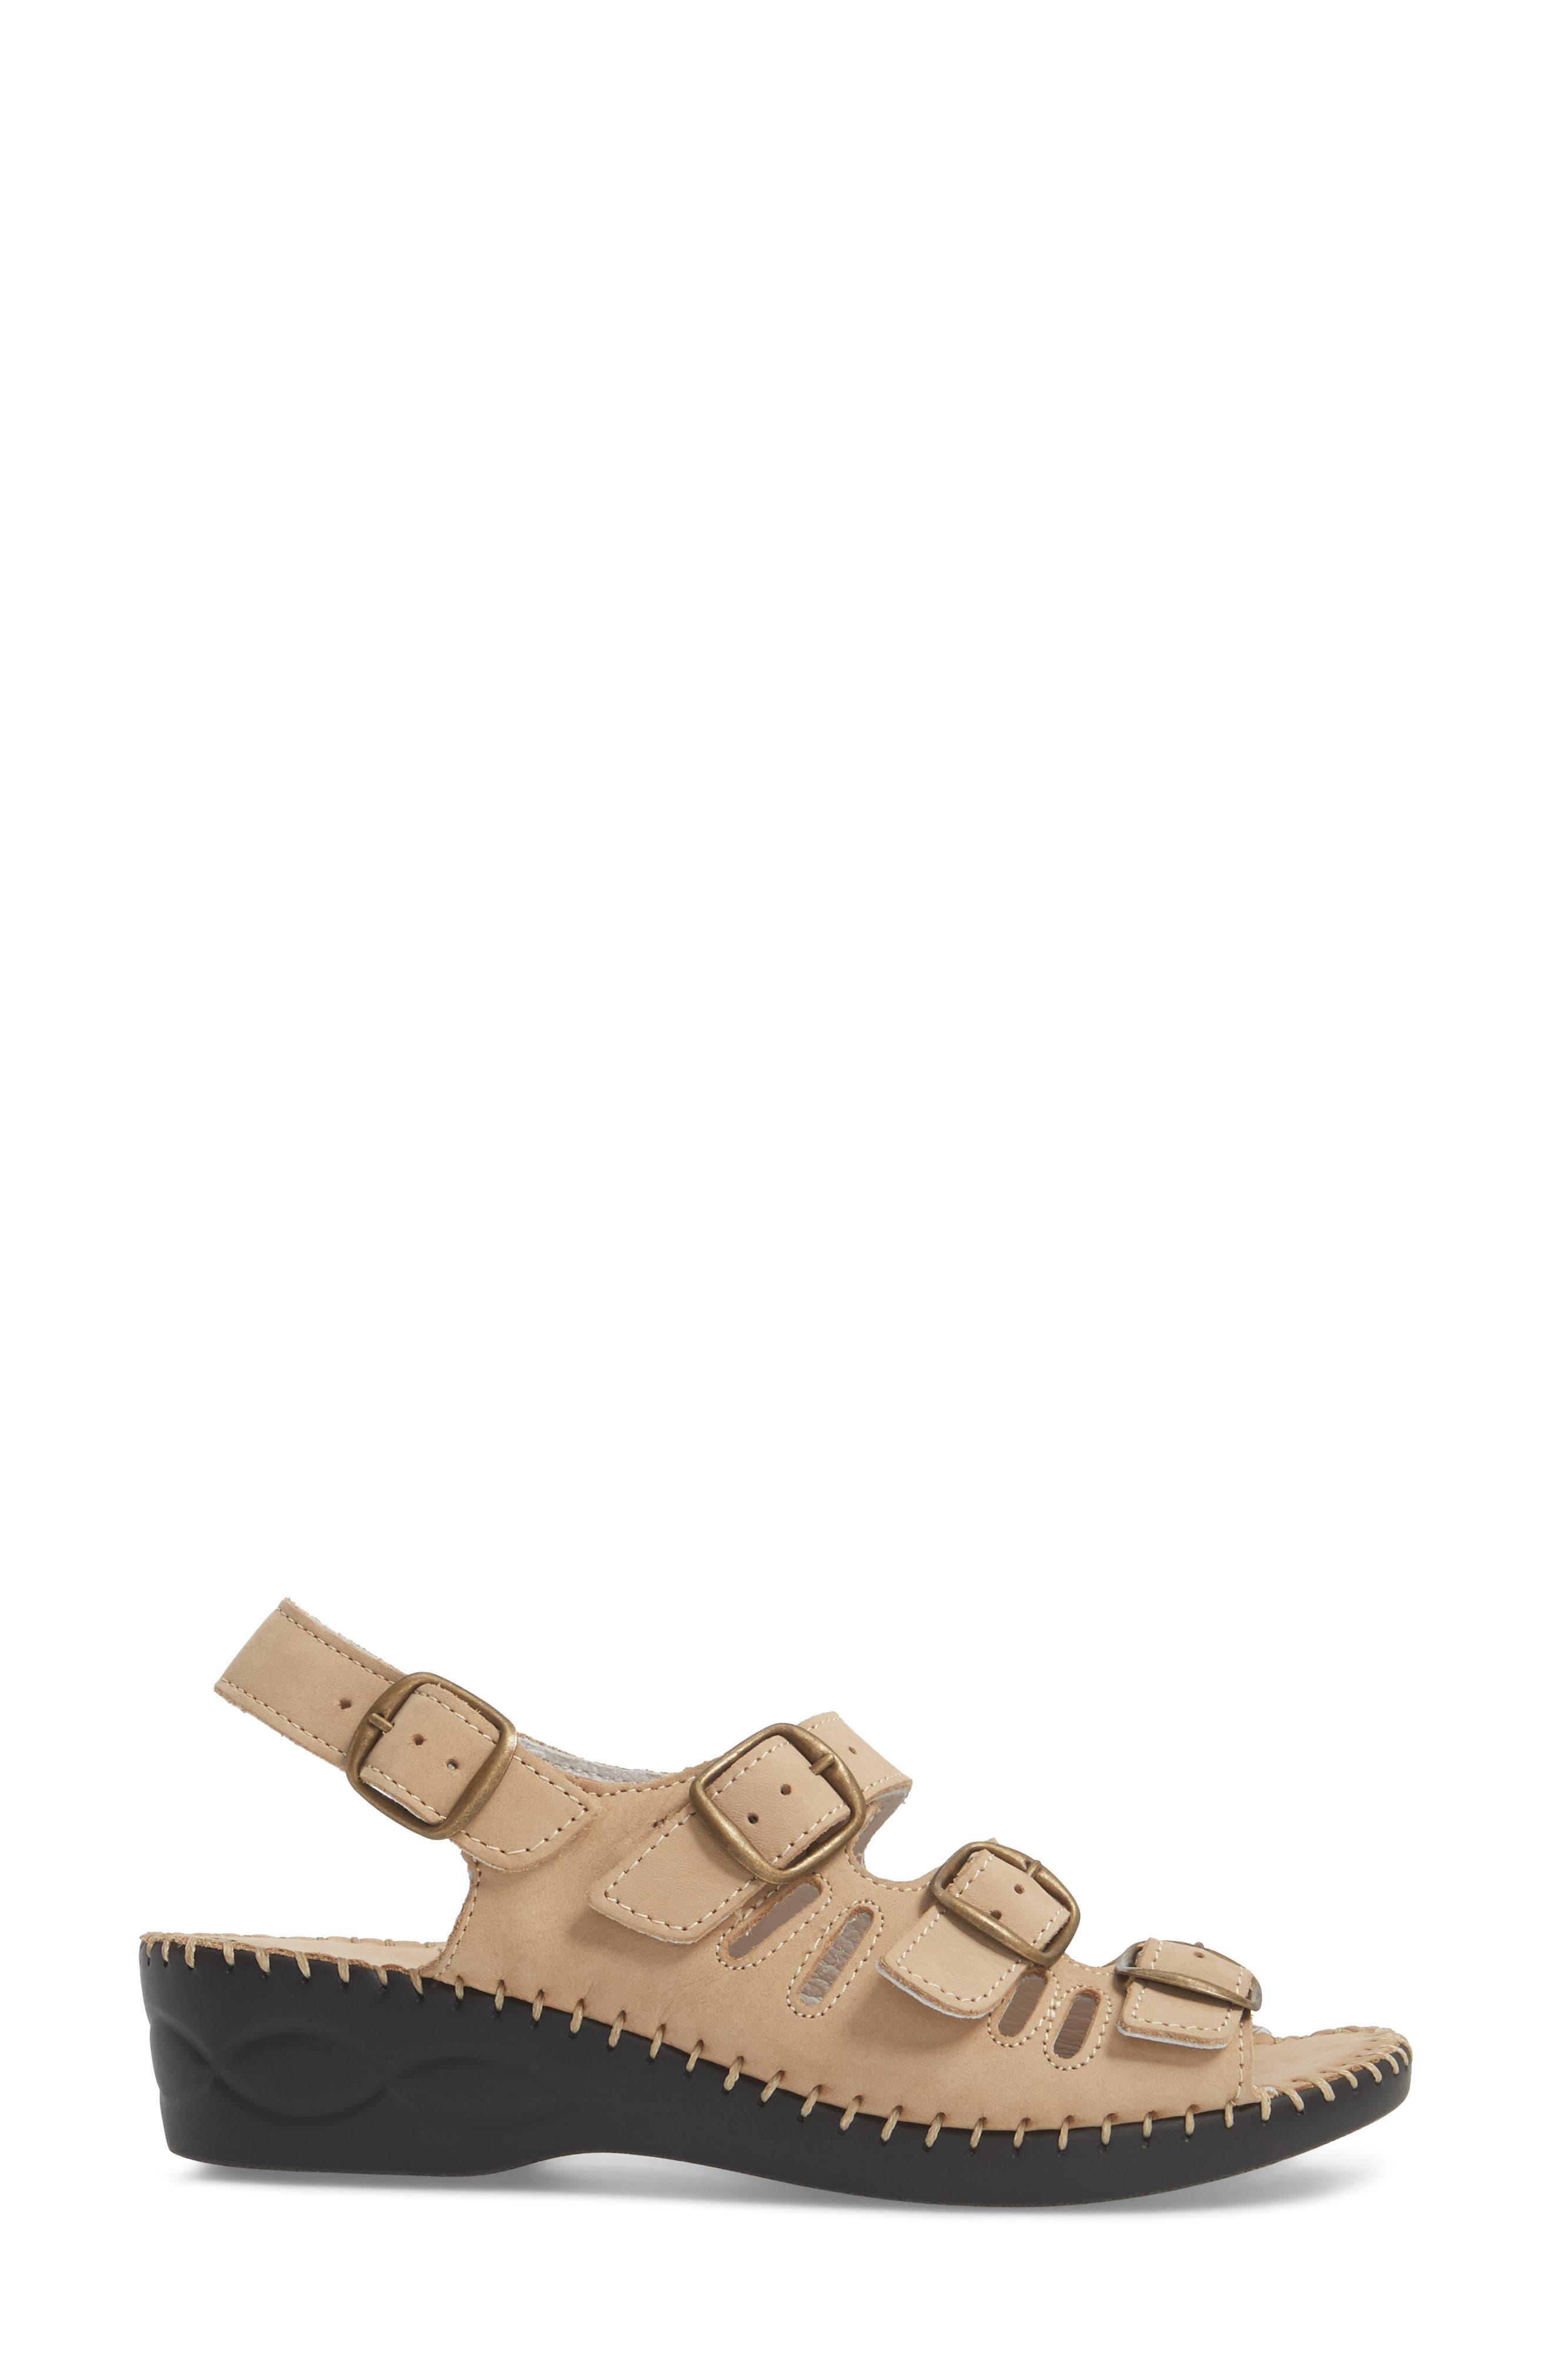 Luna Slingback Wedge Sandal,                             Alternate thumbnail 3, color,                             Cappuccino Nubuck